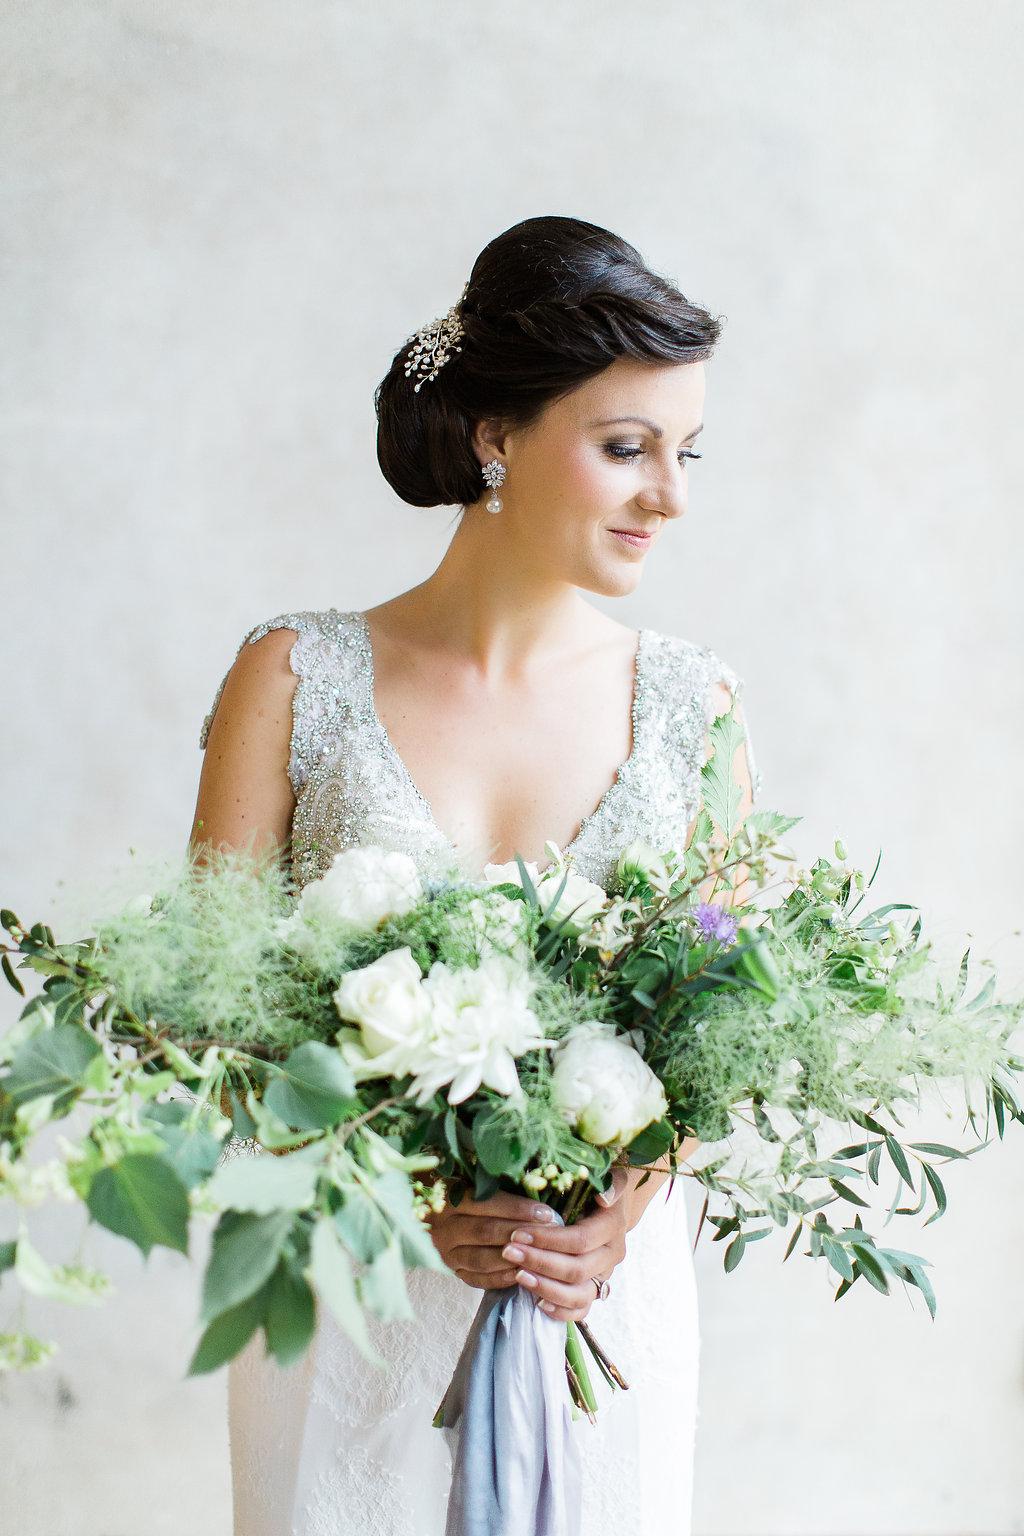 Verona-Destination-Wedding-Inspiration-by-Kibogo-Photography11.jpg